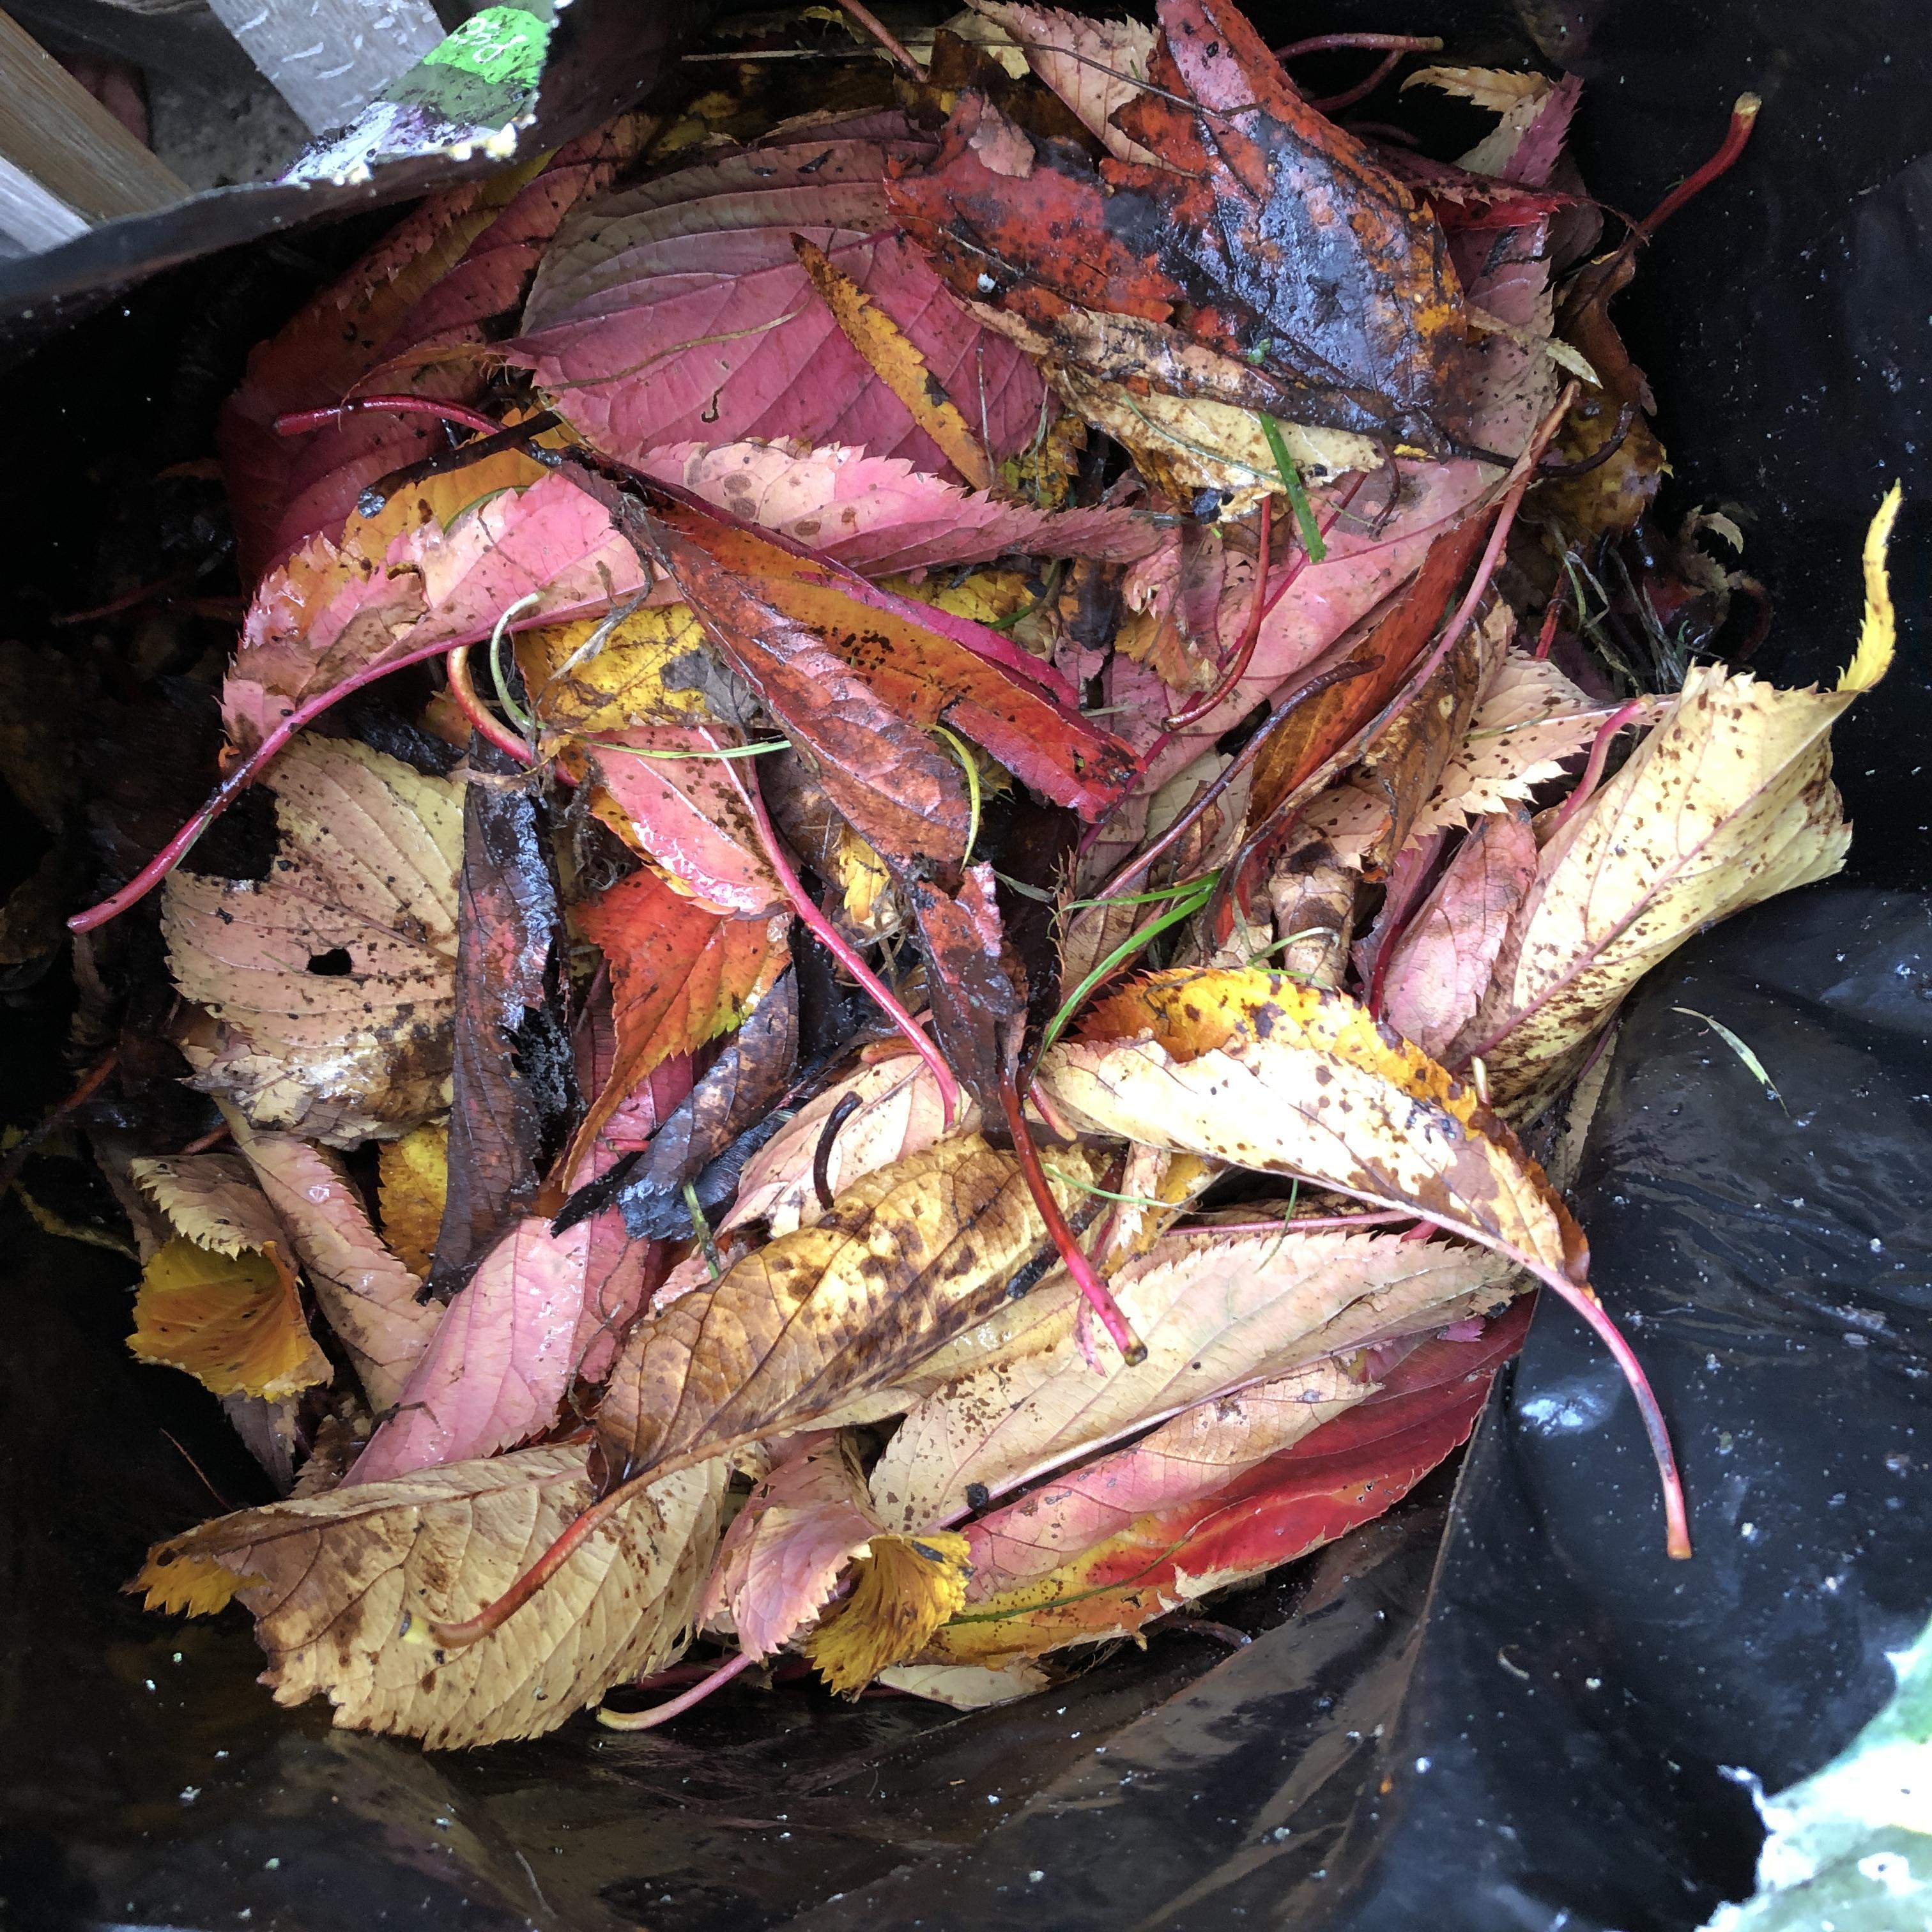 Bag of Fallen Leaves